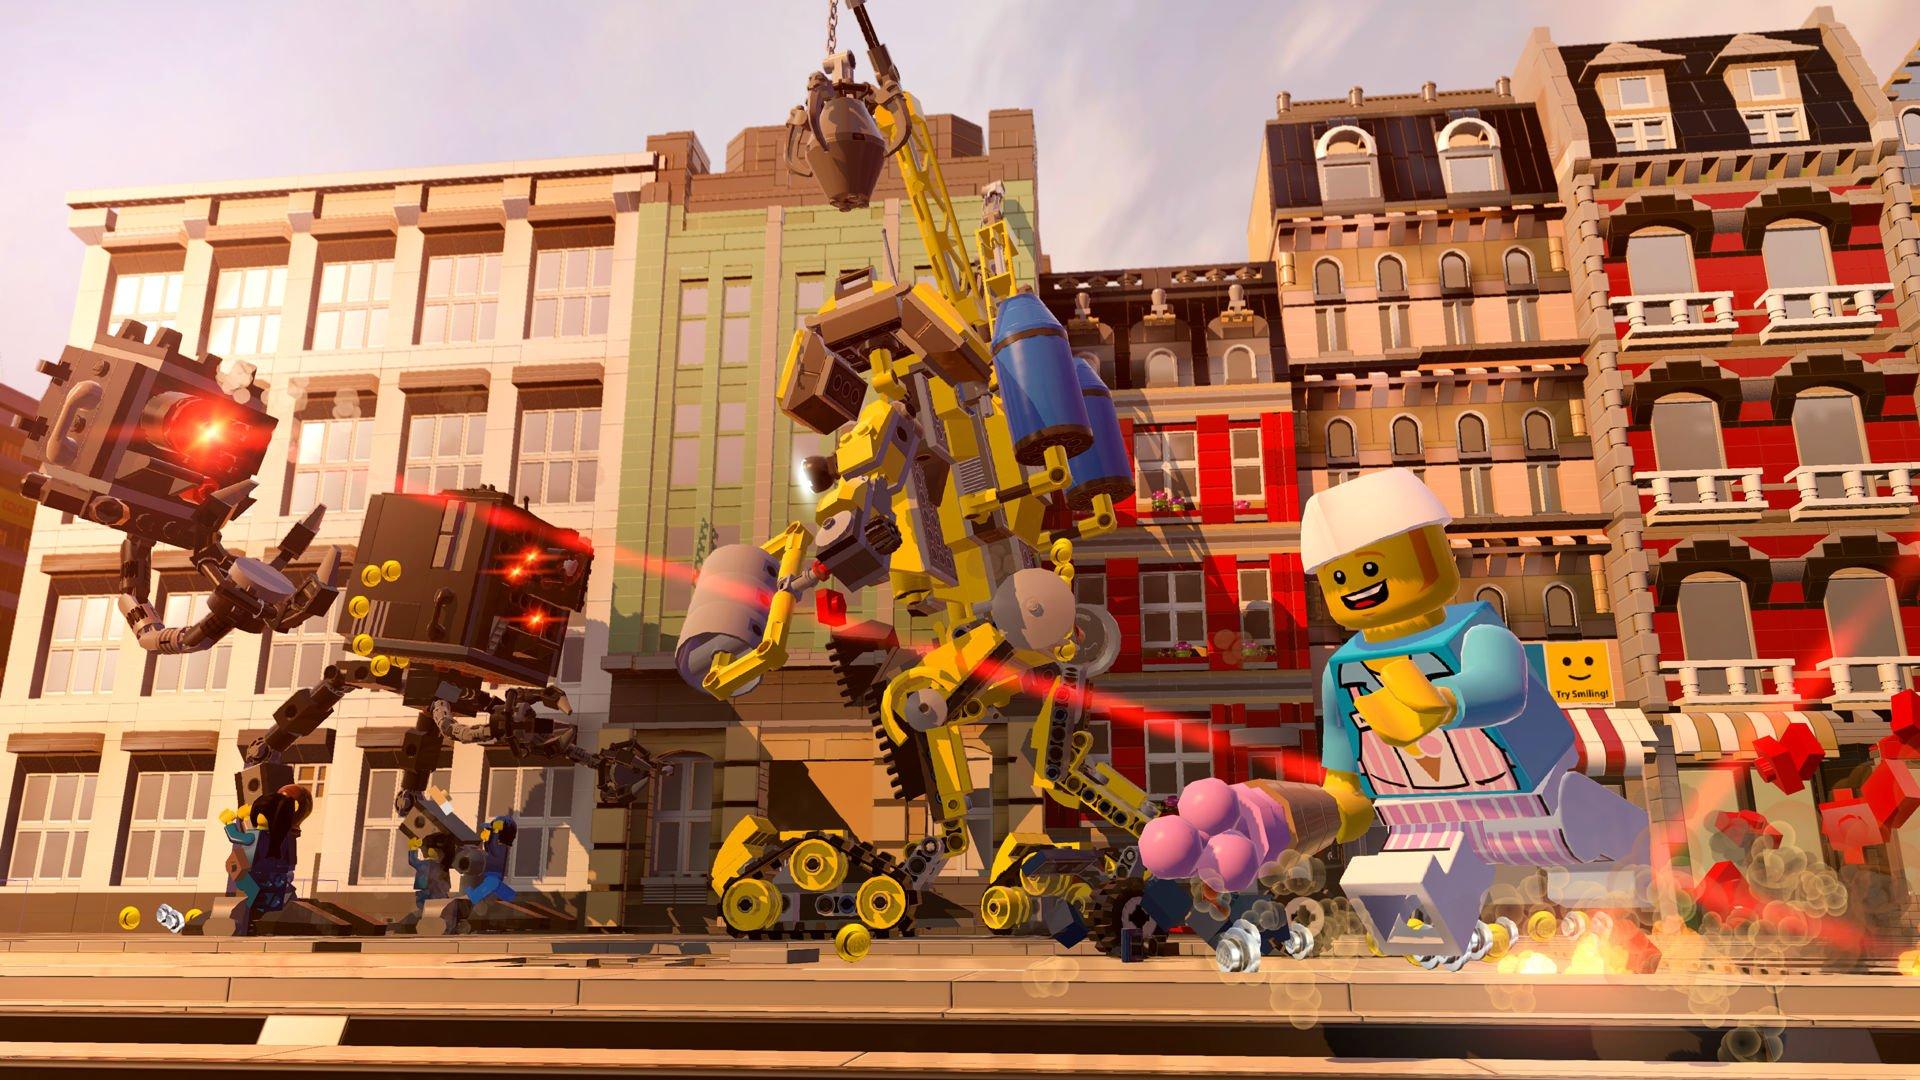 lego_movie_the_videogame-2456883.jpg